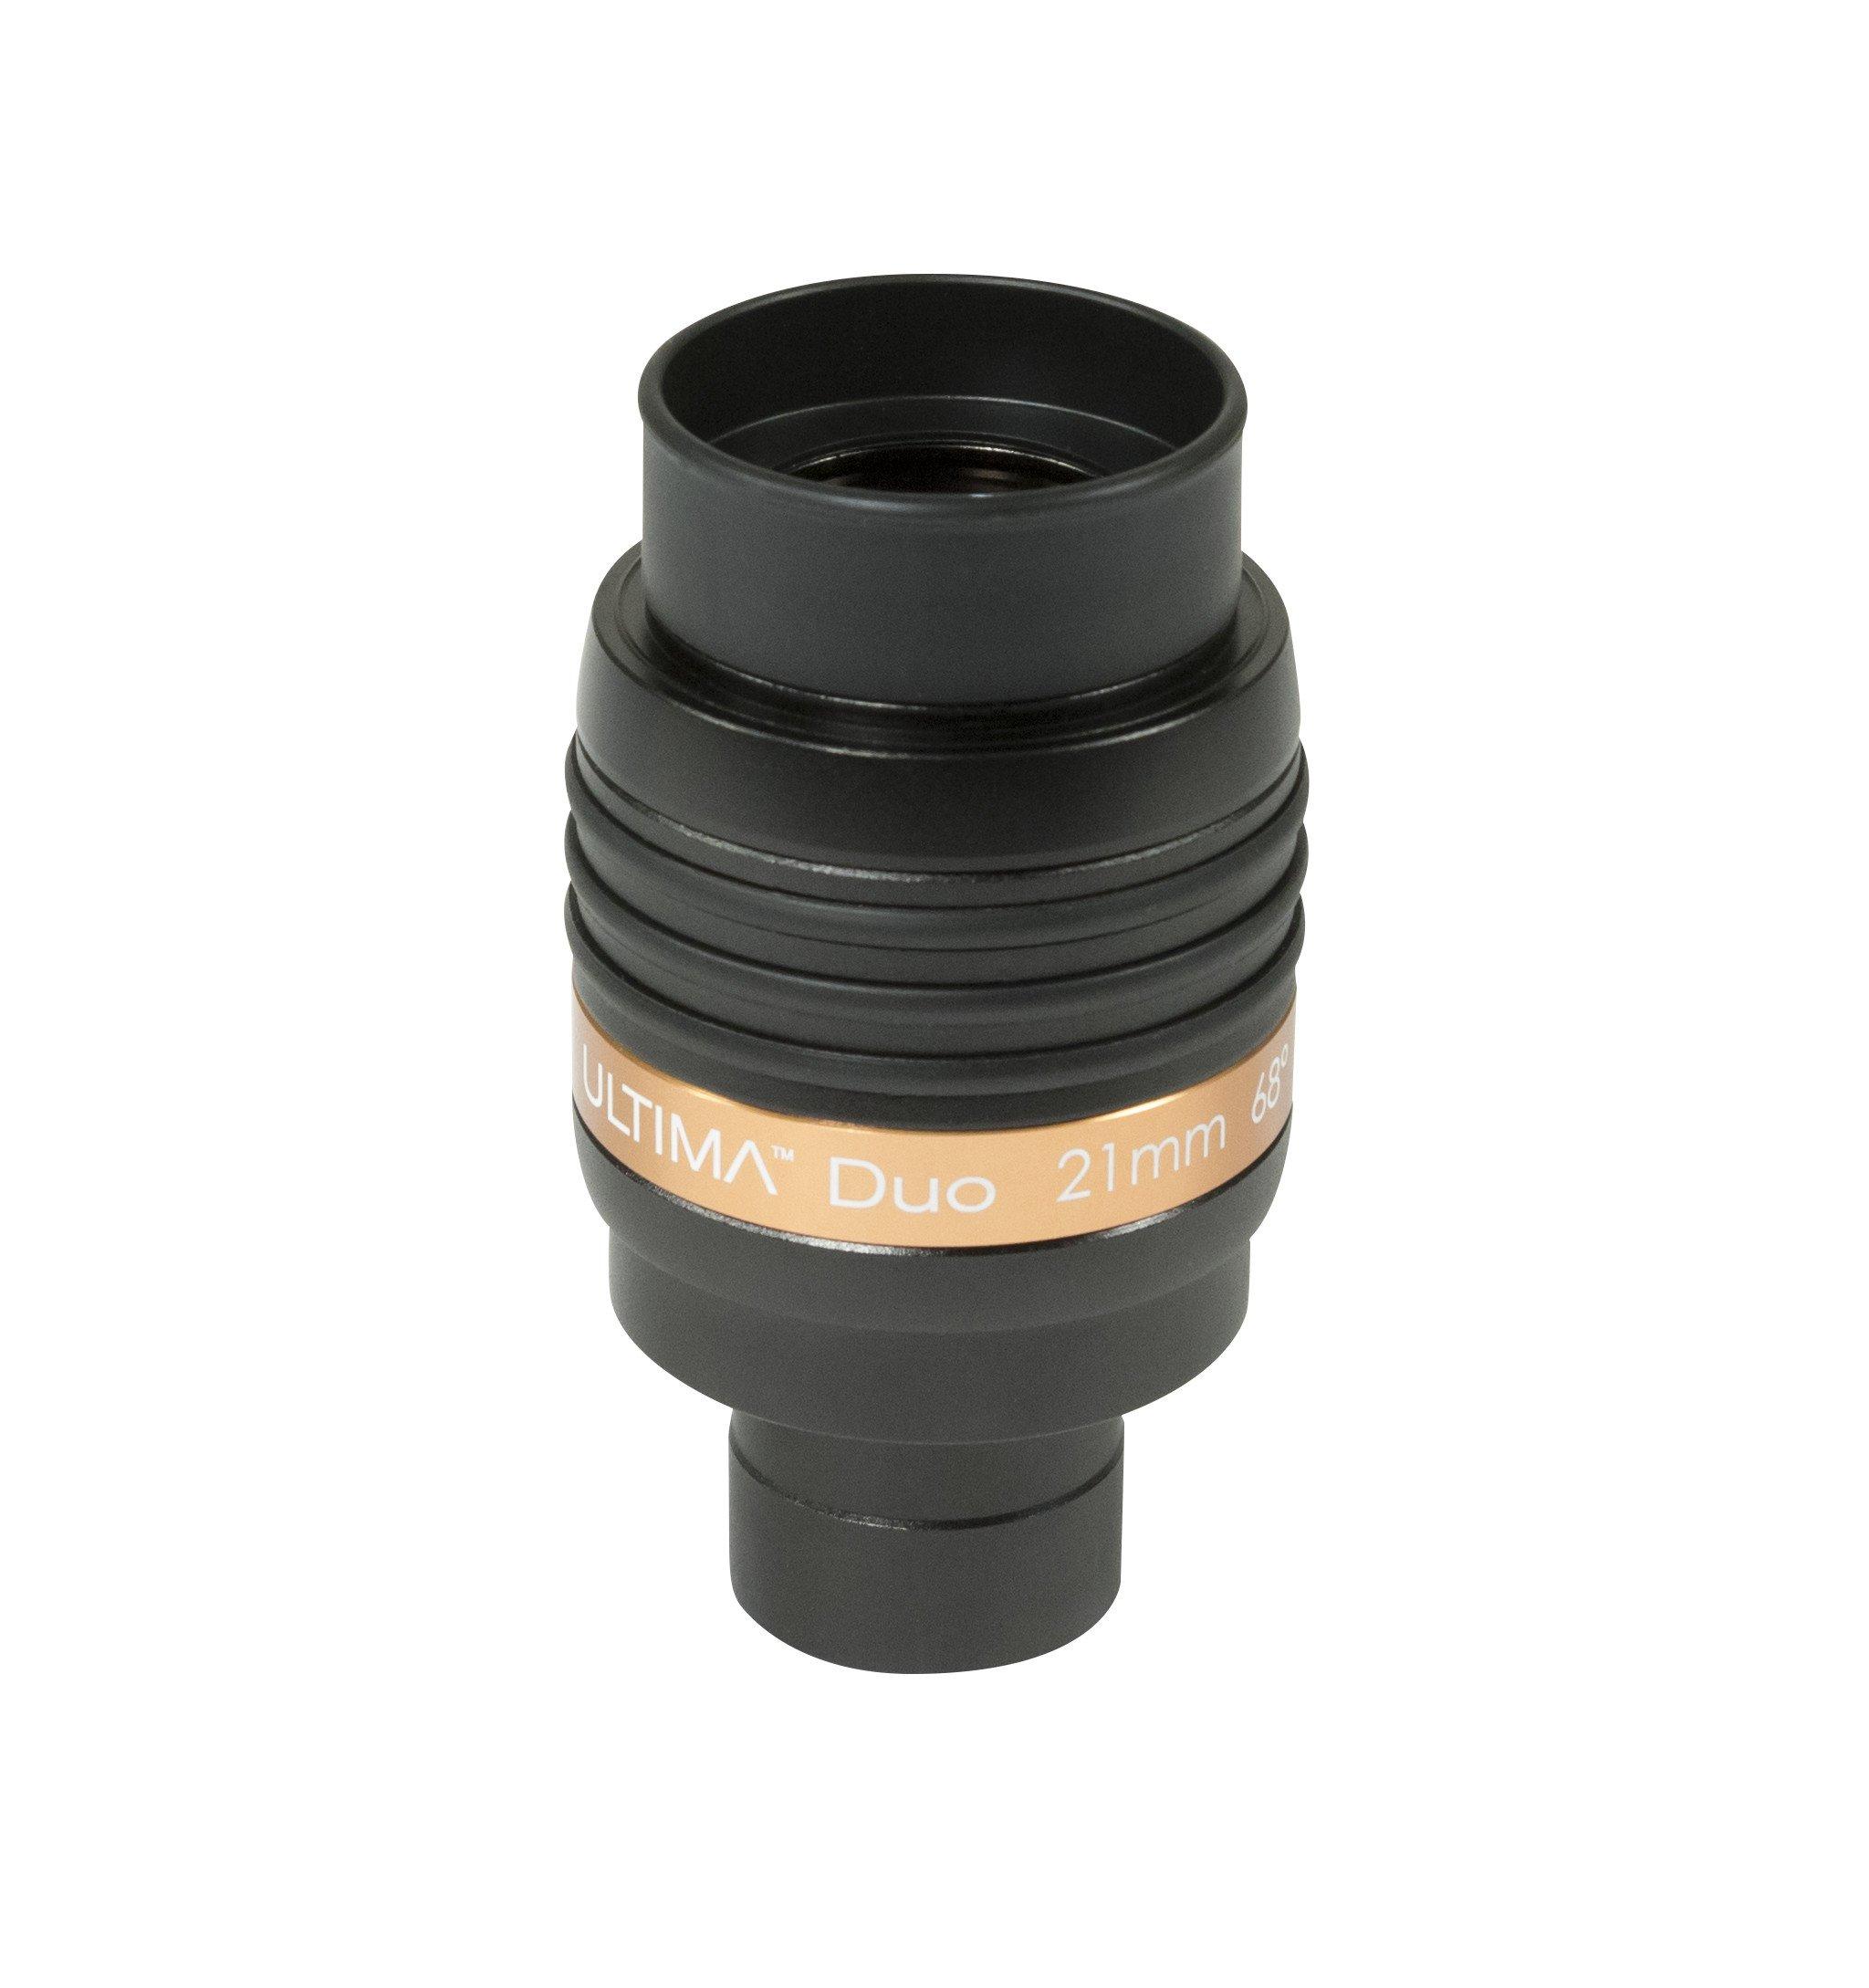 Celestron 93445 Ultima Duo Eyepiece, 1.25/2-Inch, 21mm (Black)